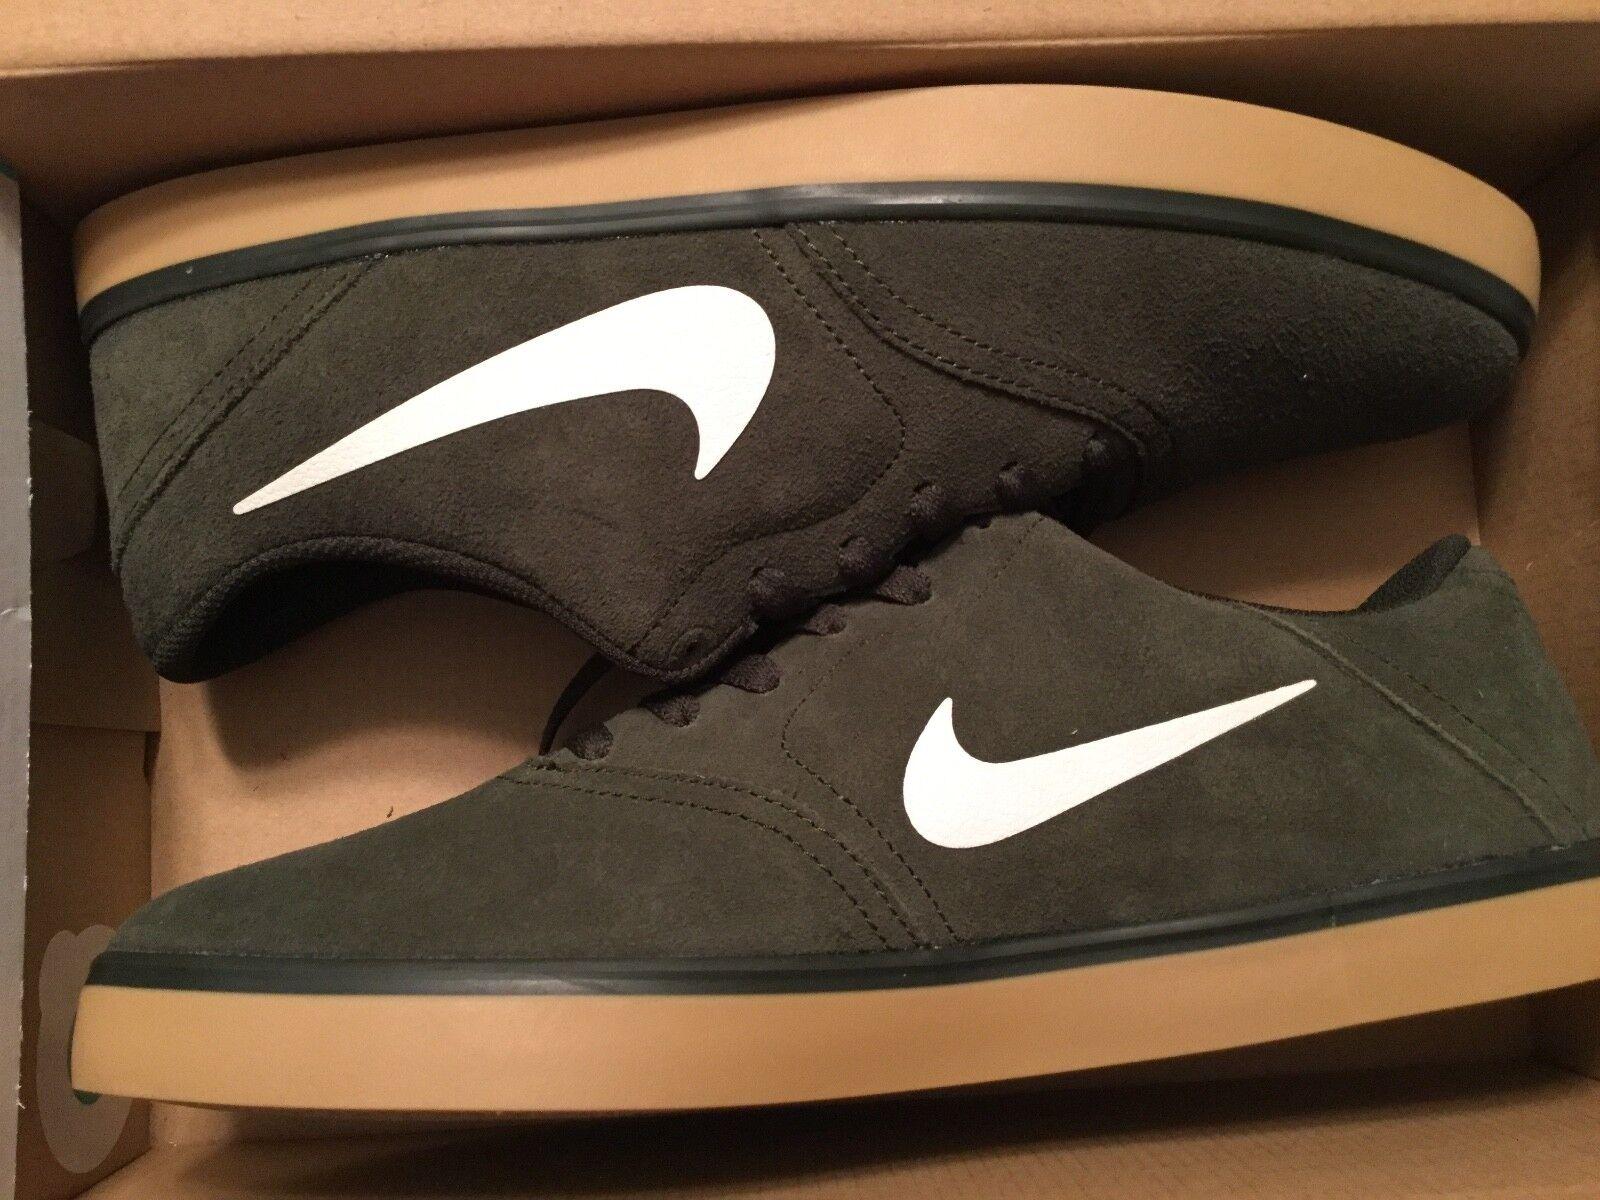 New Mens Nike SB Check Skateboarding Shoes 705265-312 Sz 12 Seasonal price cuts, discount benefits